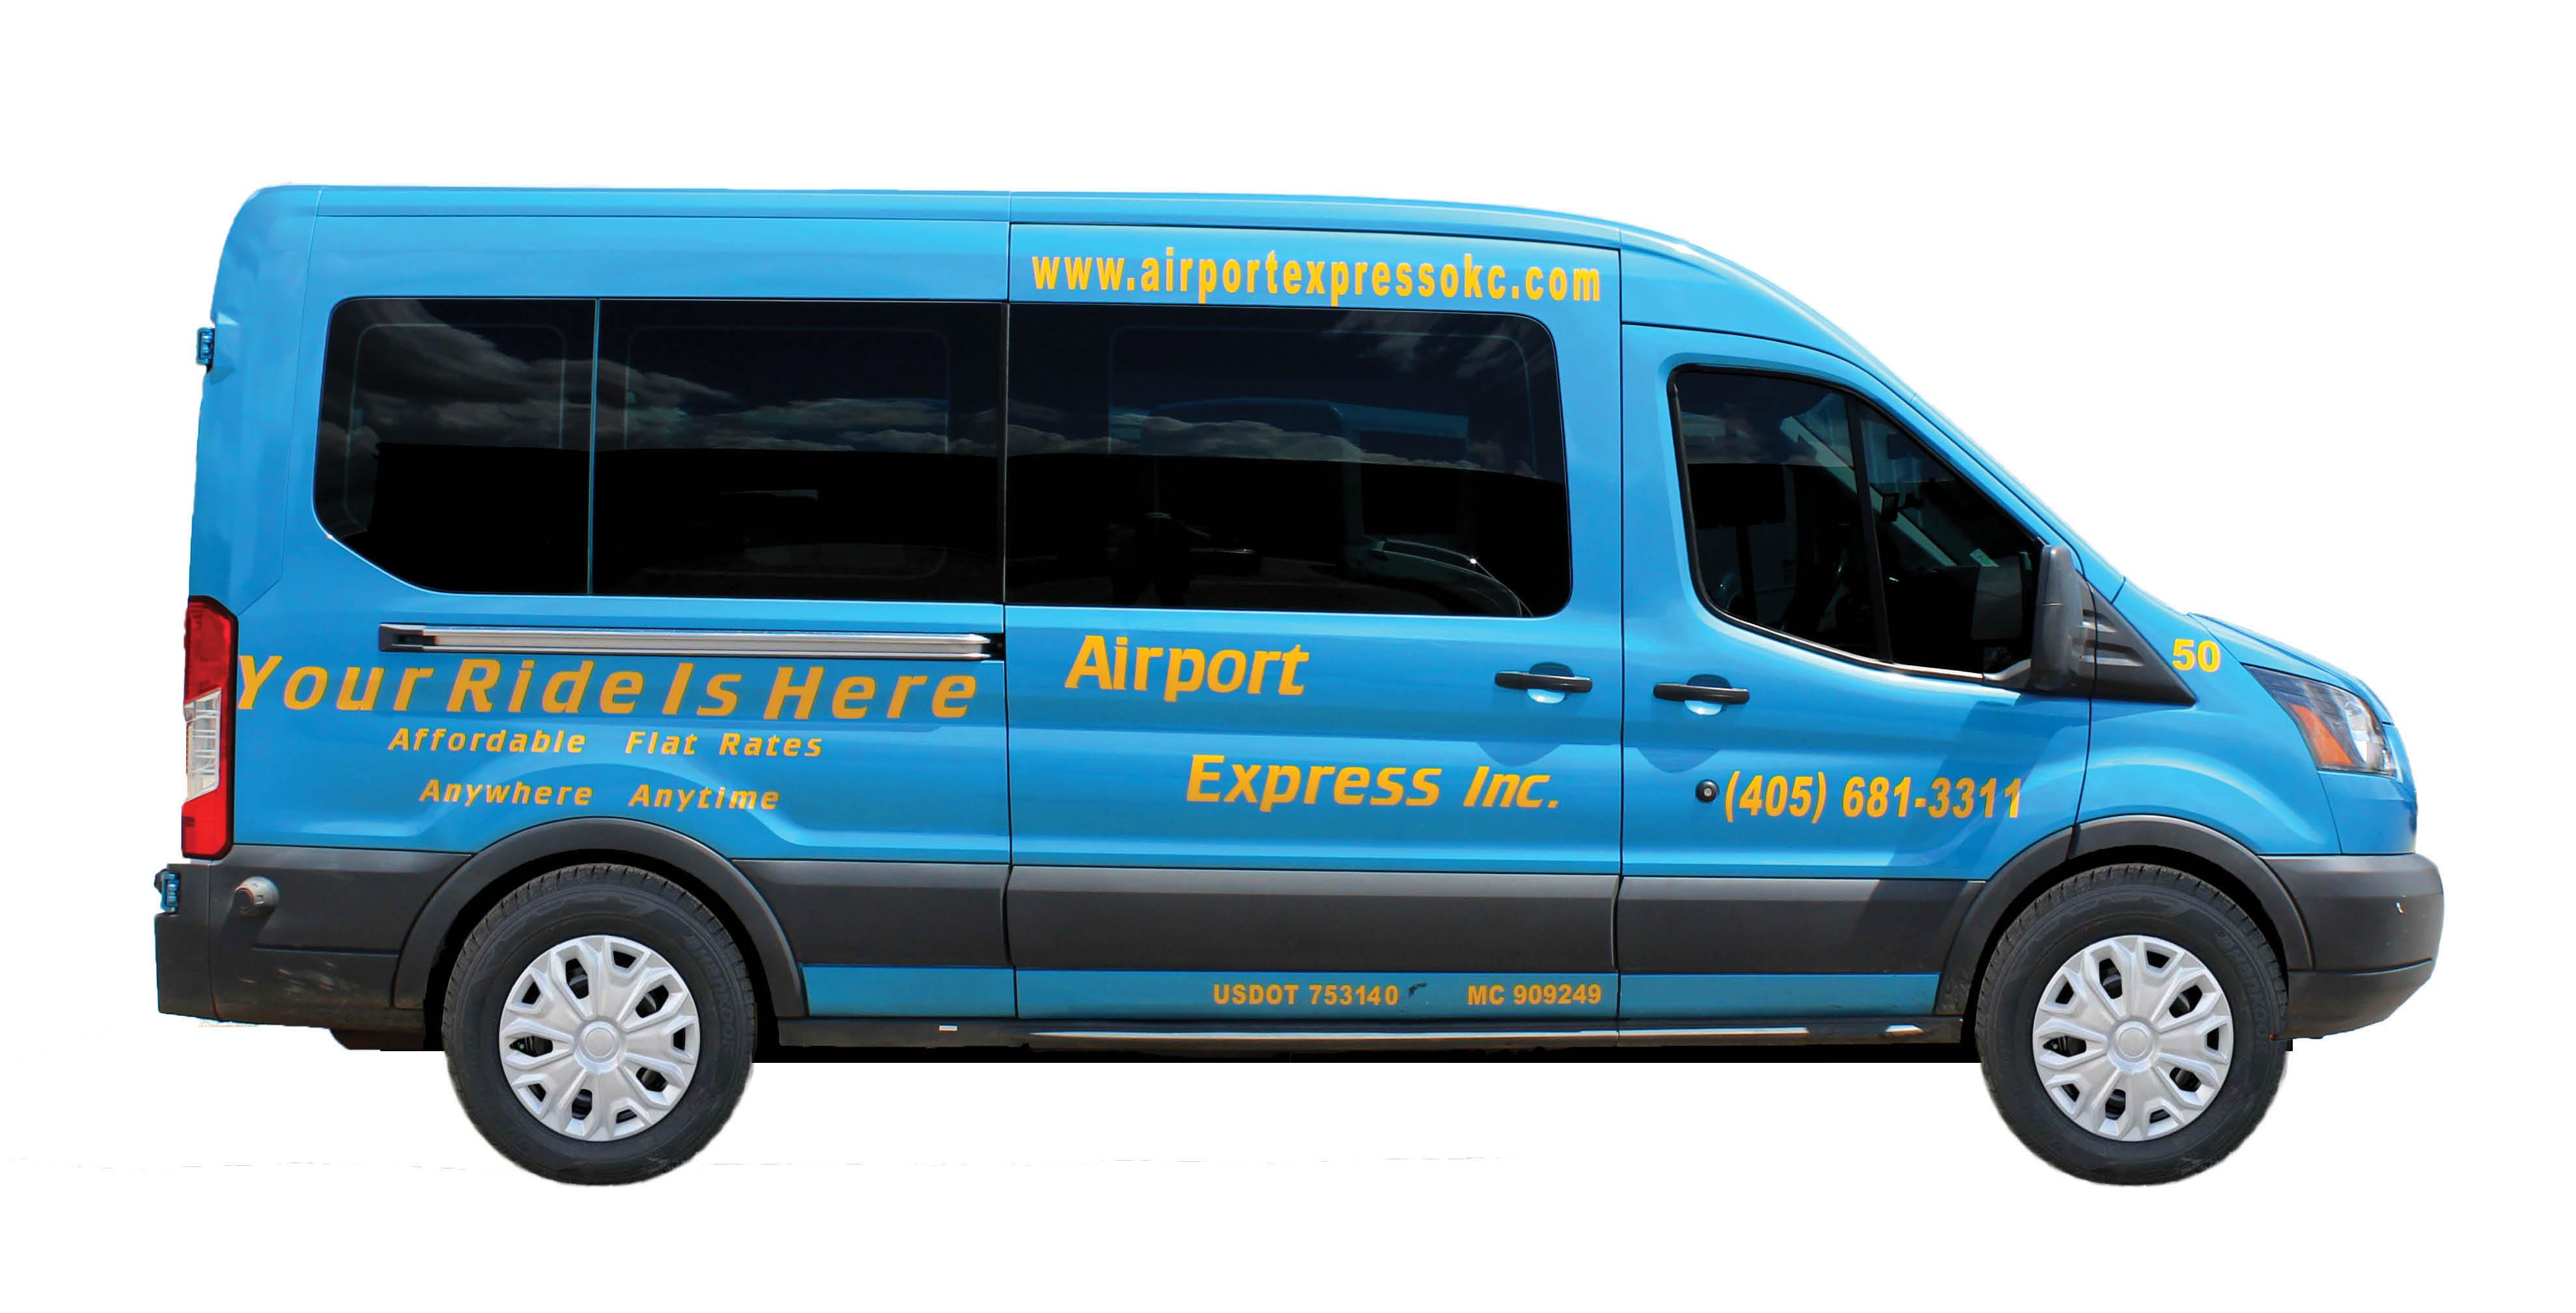 Airport Express transportation vehicles/vans